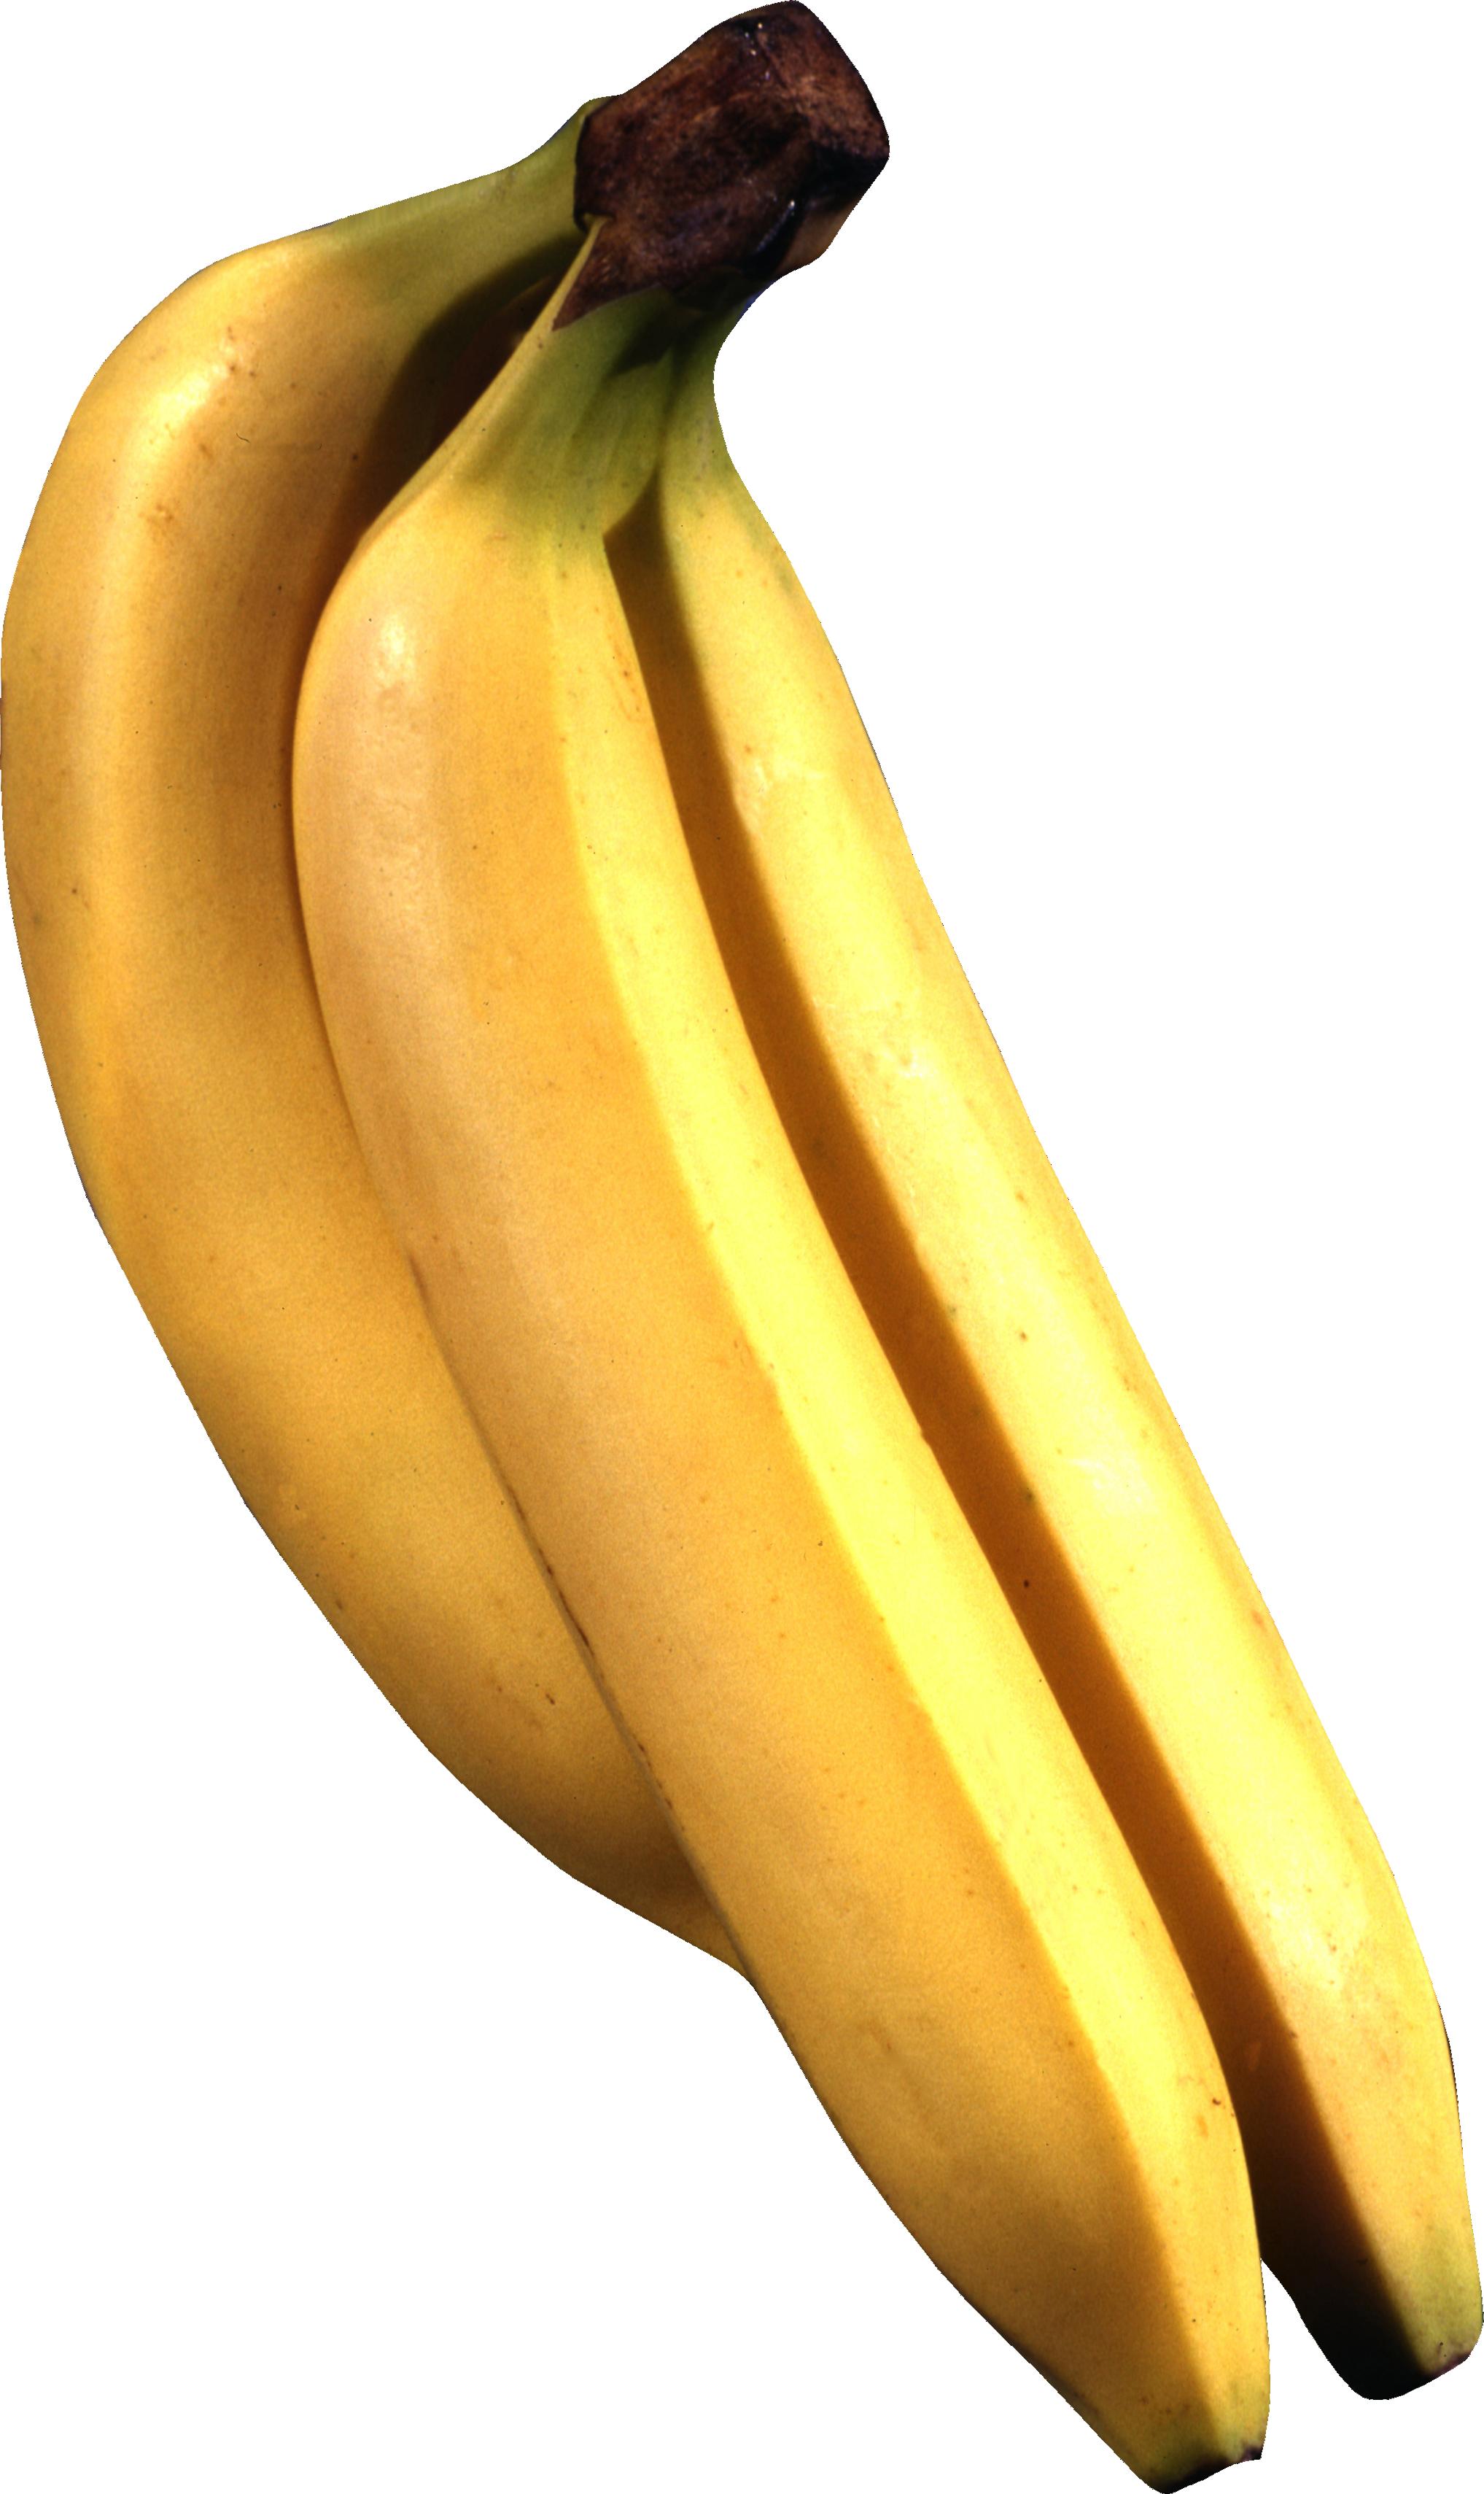 Png image purepng free. Orange clipart banana